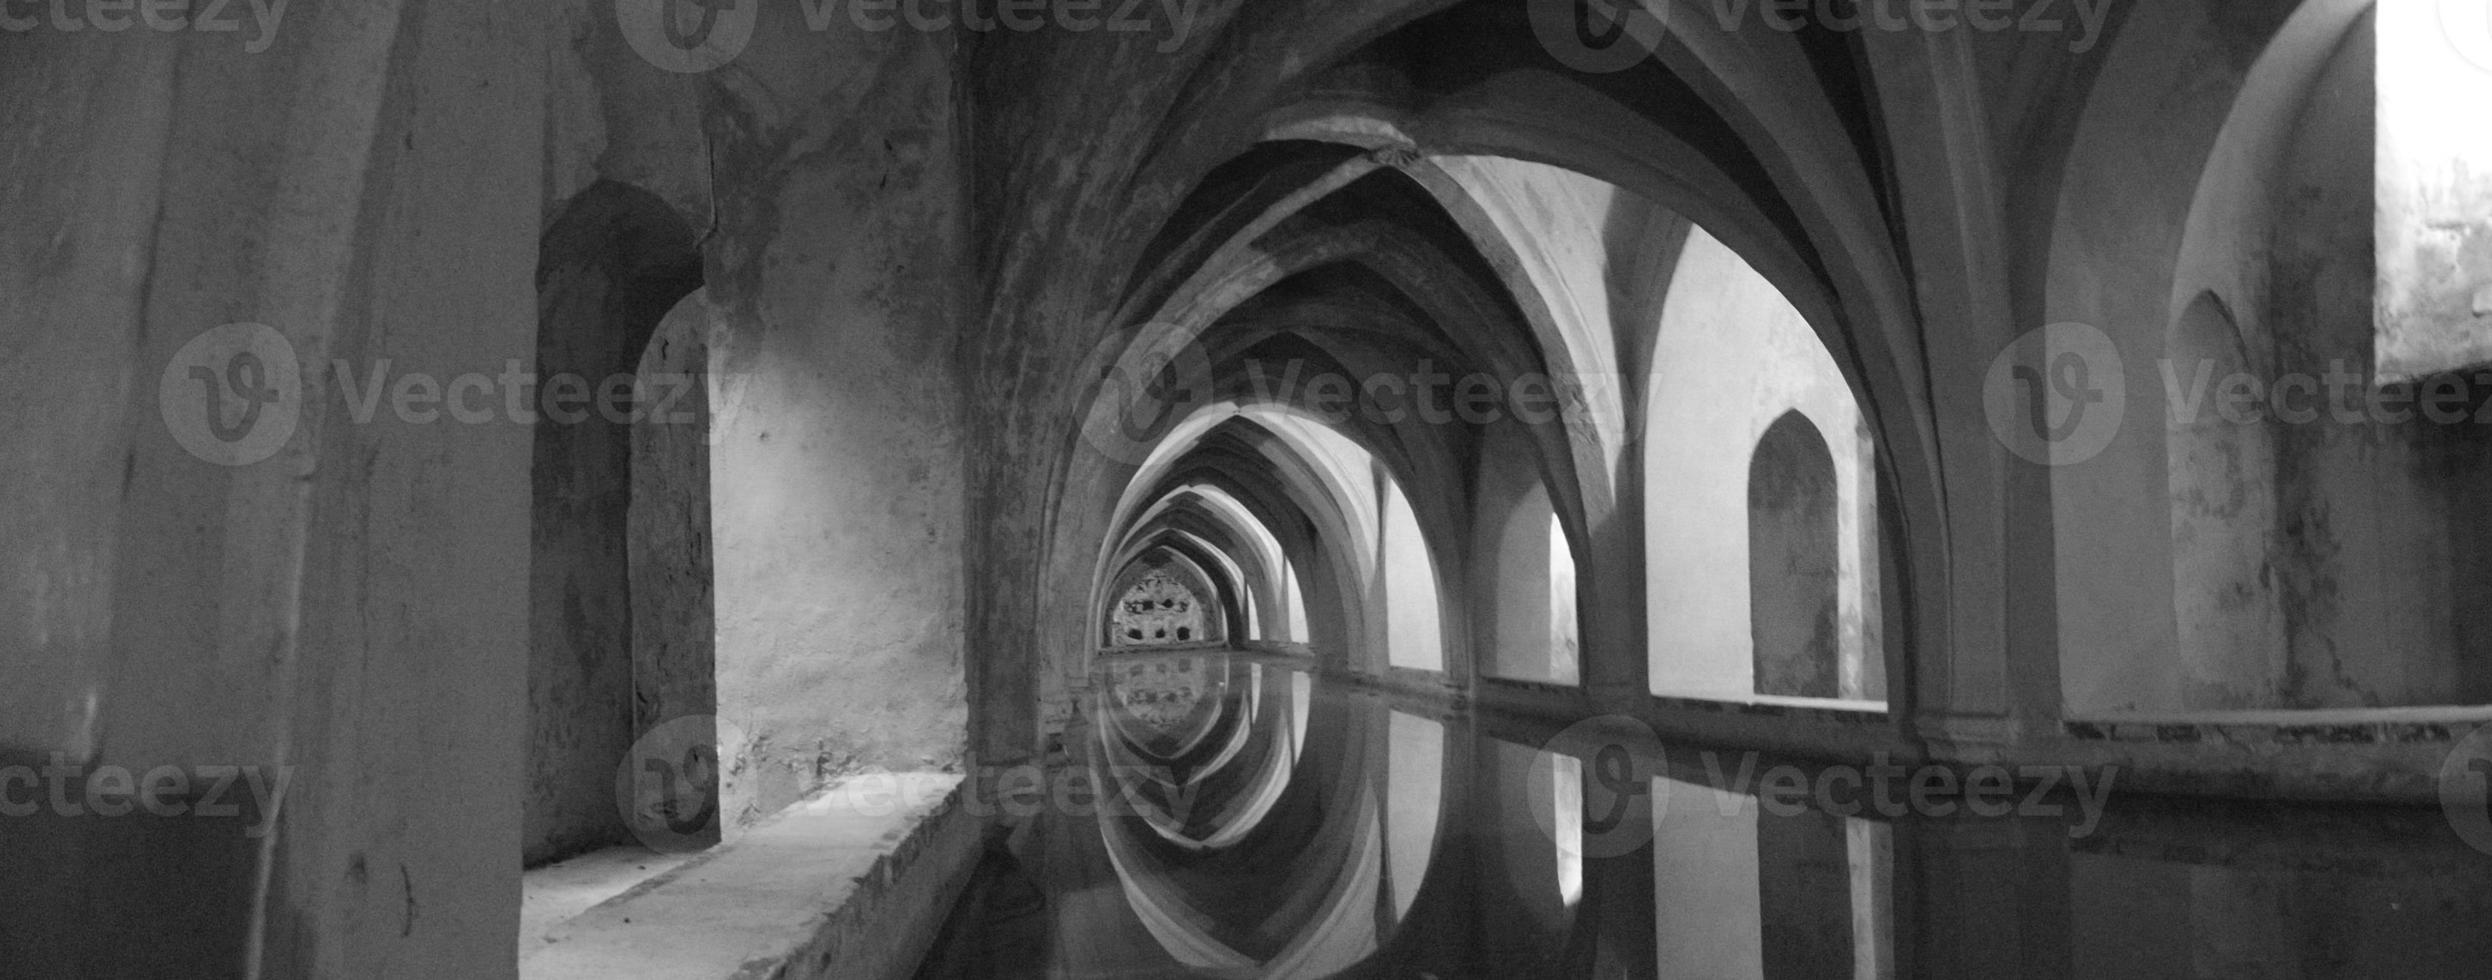 bagno arabo in bianco e nero foto